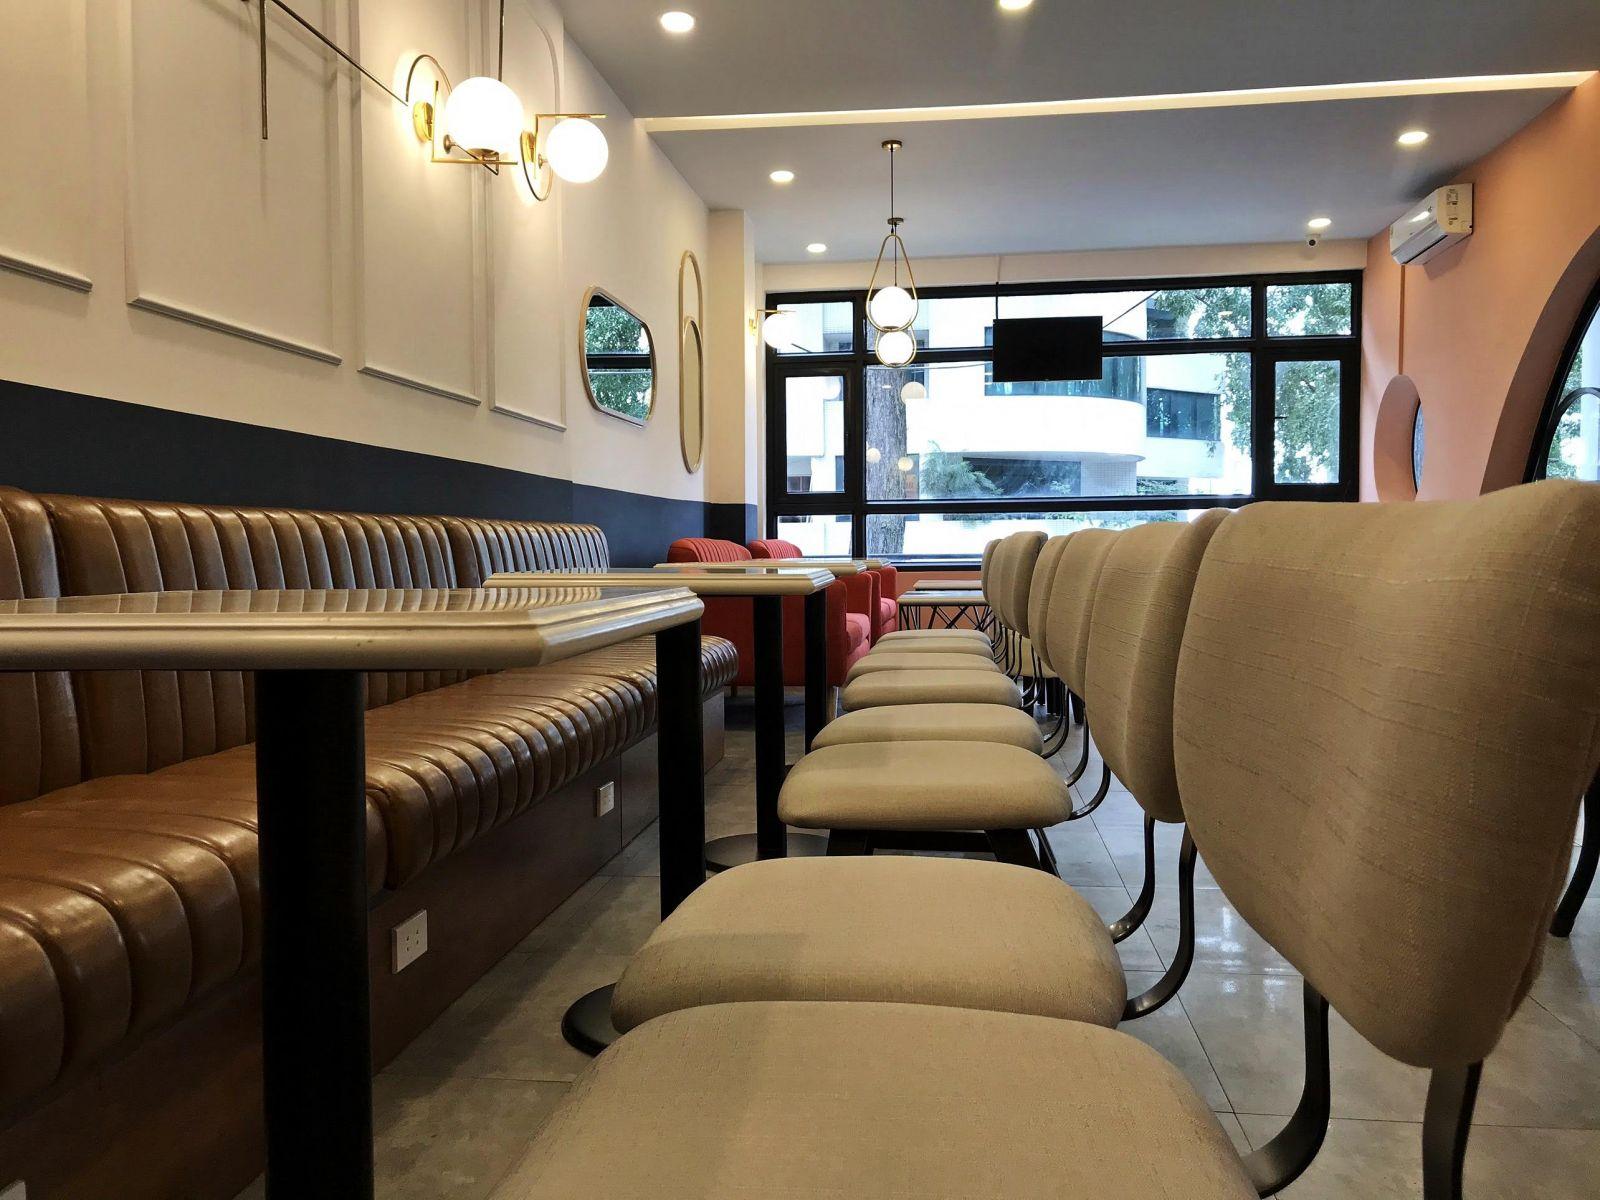 noi-that-Felicite-Coffee&Eatery-42-Tran-Cao-Van-Q3-13